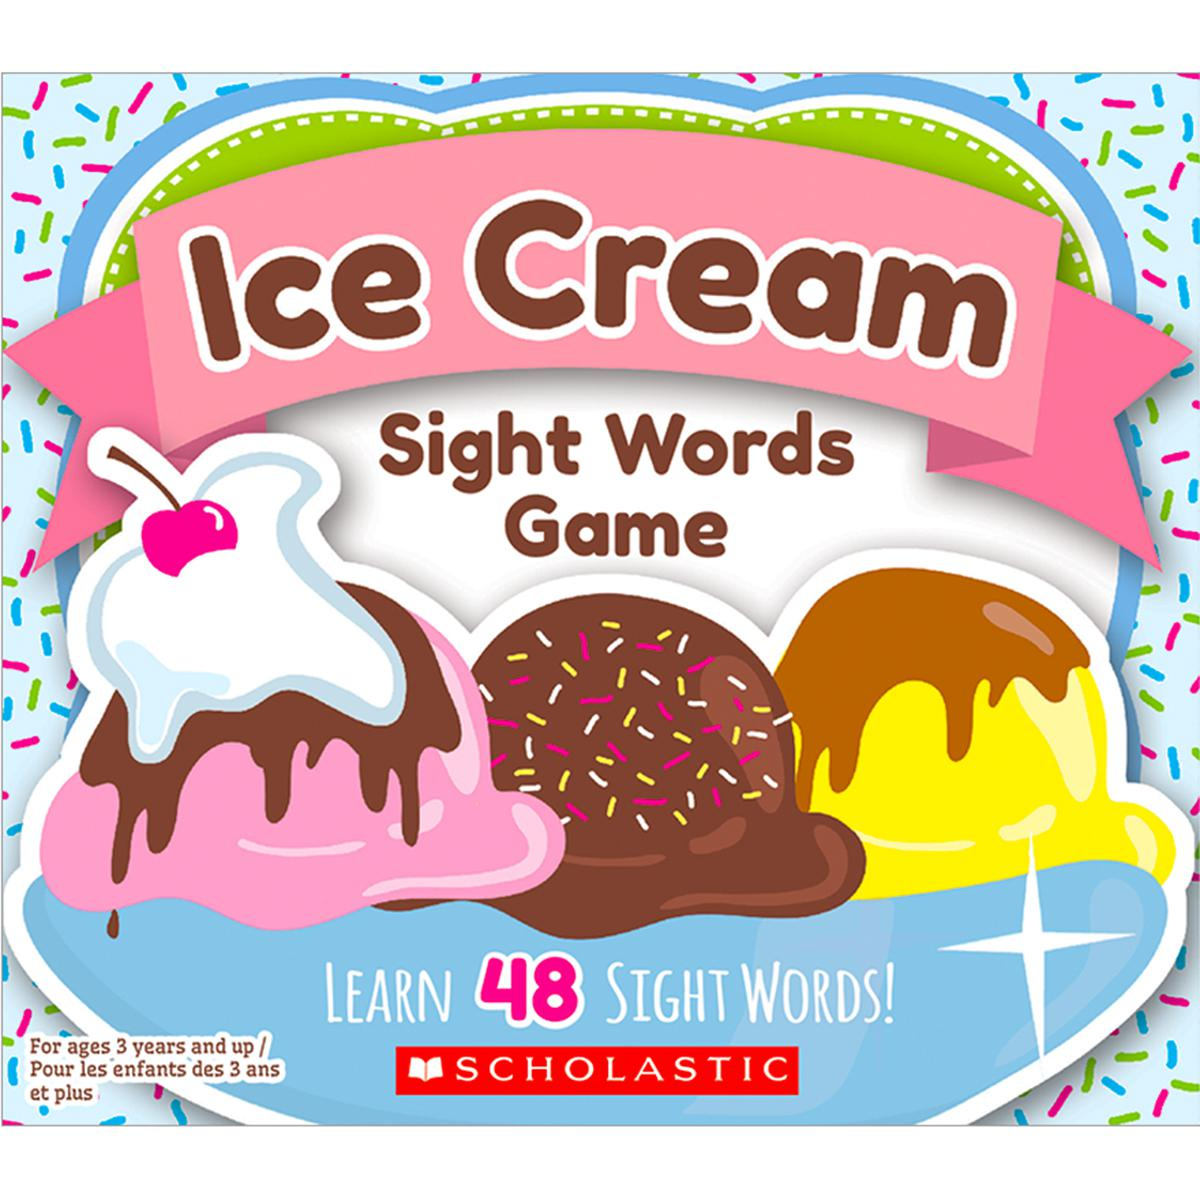 Ice Cream Sight Words Game